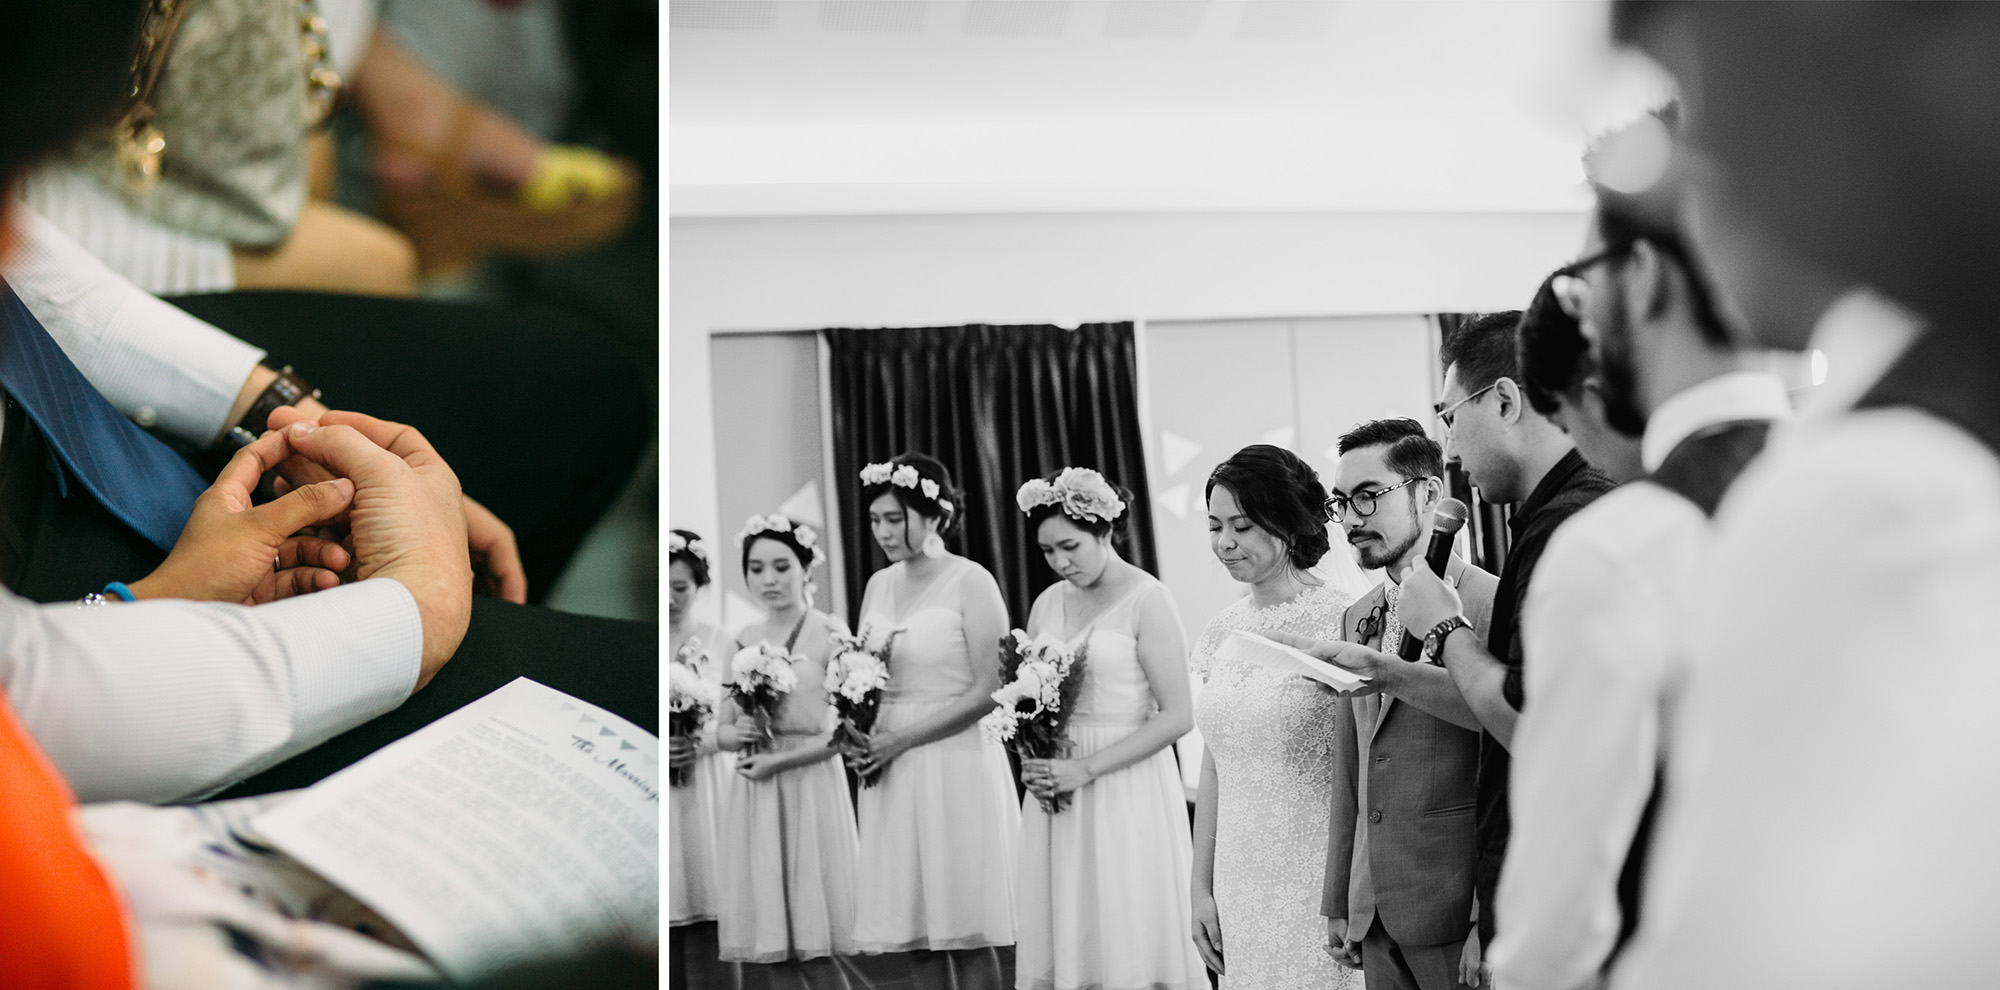 111-hellojanelee-sam grace-malaysia-wedding-day